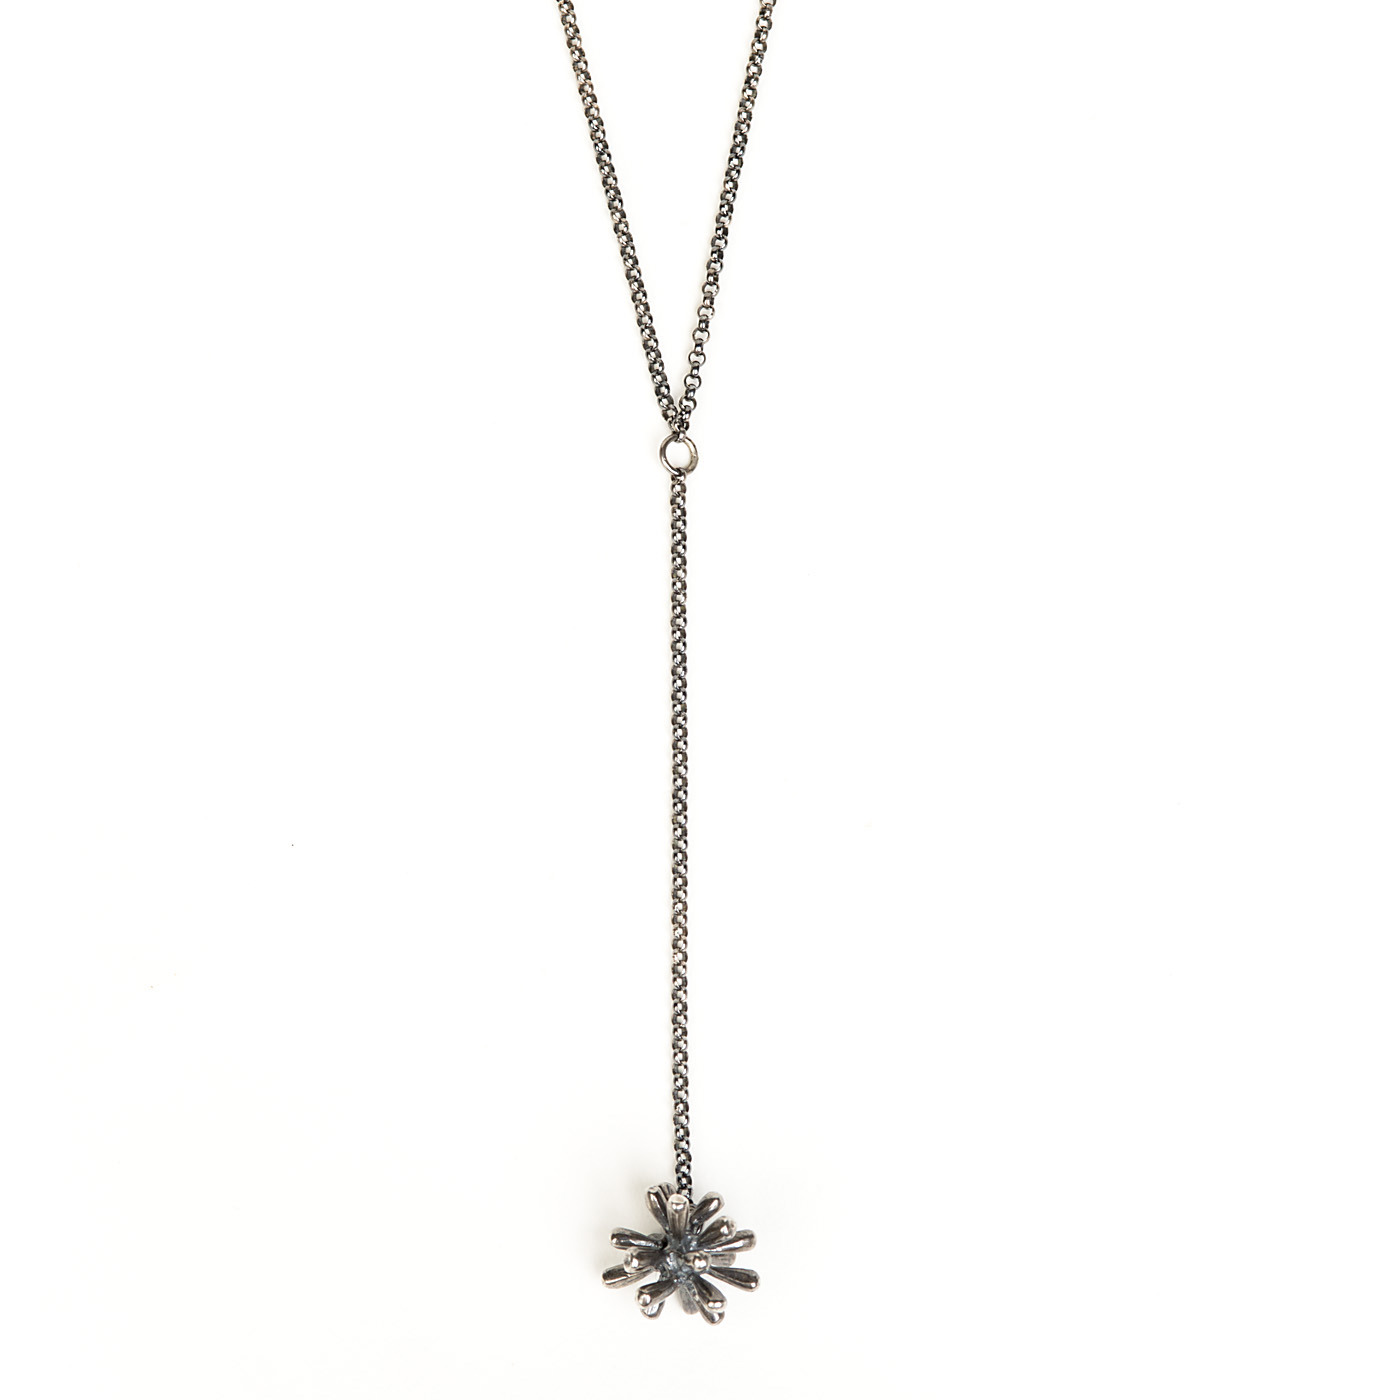 Artisan, Eco-Friendly, Designer Jack's Ball Necklace